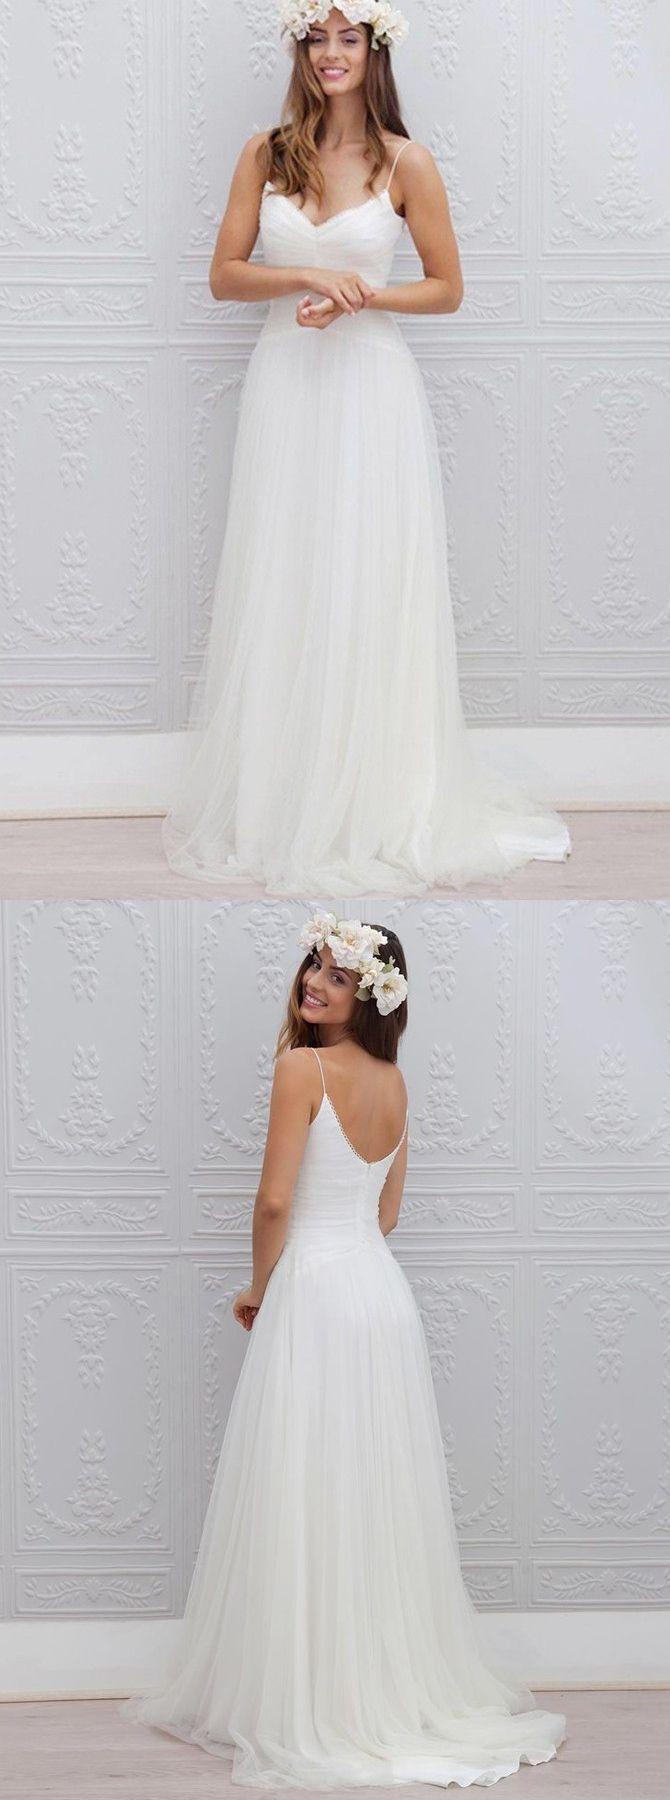 Beach wedding dressesopen back wedding dressesspaghetti strap